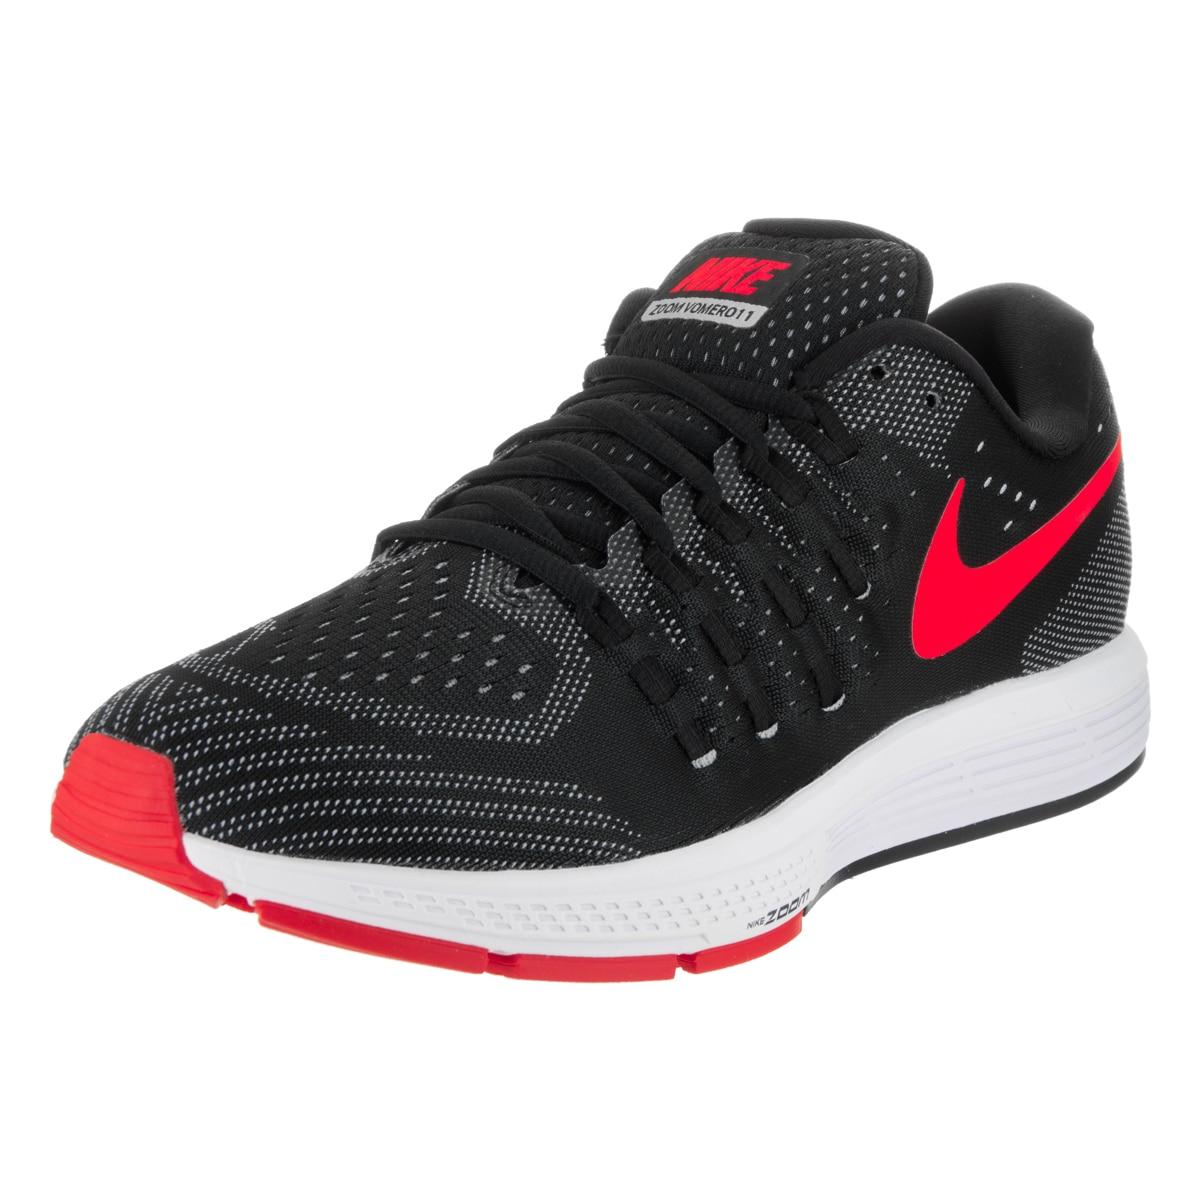 Nike Men's Air Zoom Vomero 11 Running Shoes (11), Black (...